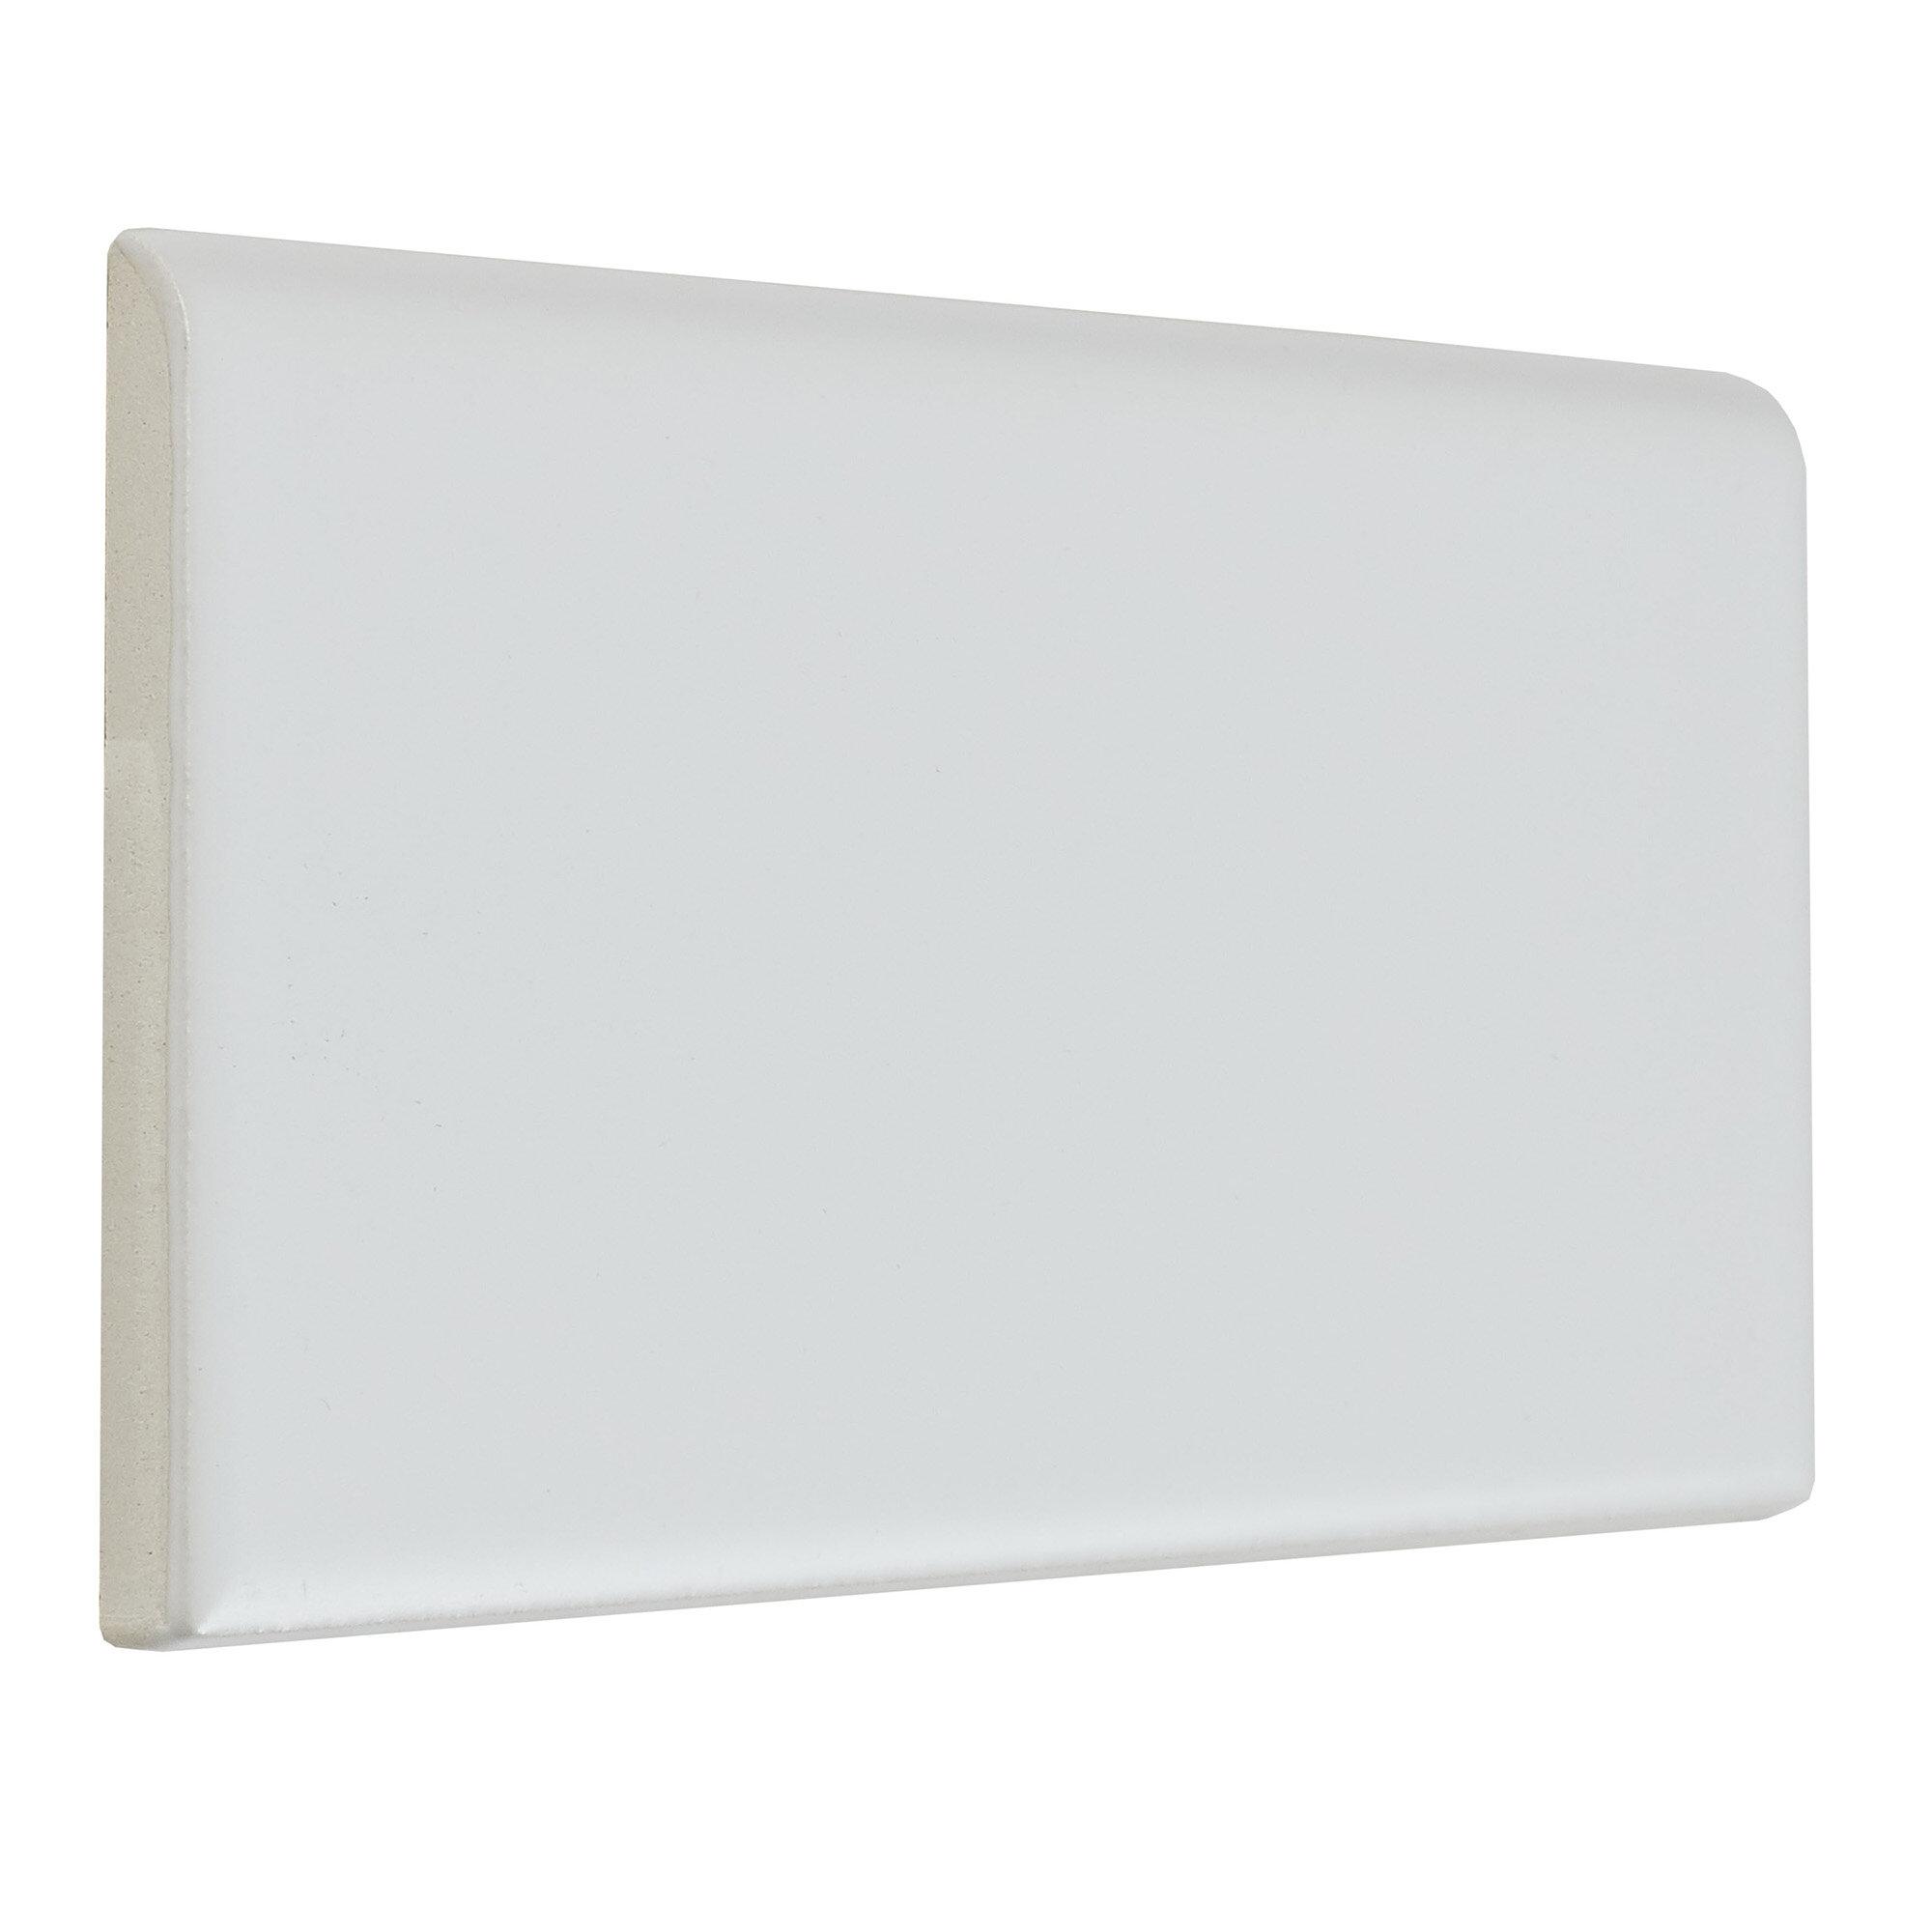 Guilford 6 X 3 Ceramic Bullnose Tile Trim In Matte Arctic White